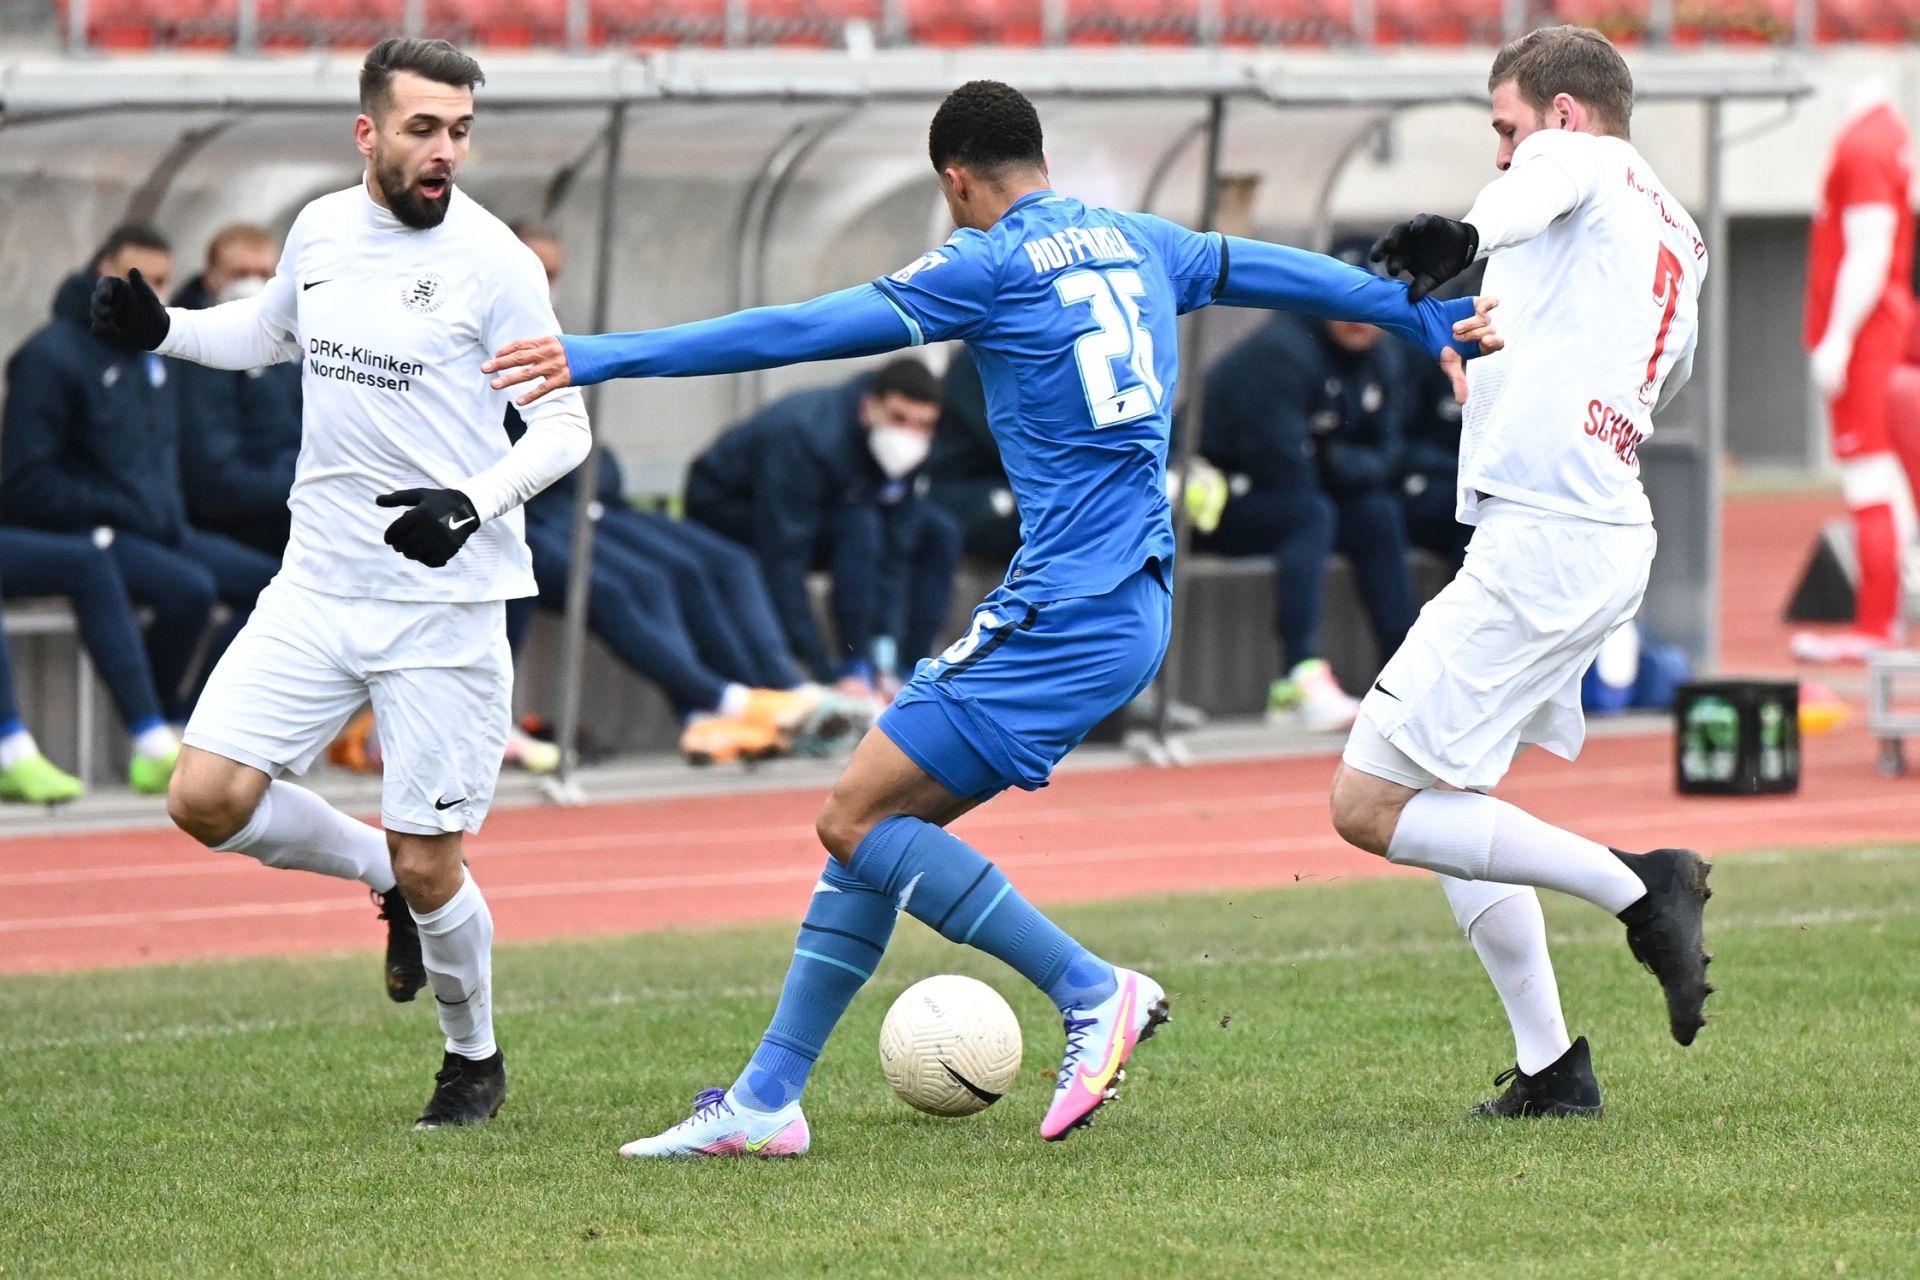 Regionalliga S�dwest 2020/21, KSV Hessen Kassel, TSG Hoffenheim II, Endstand 2:2